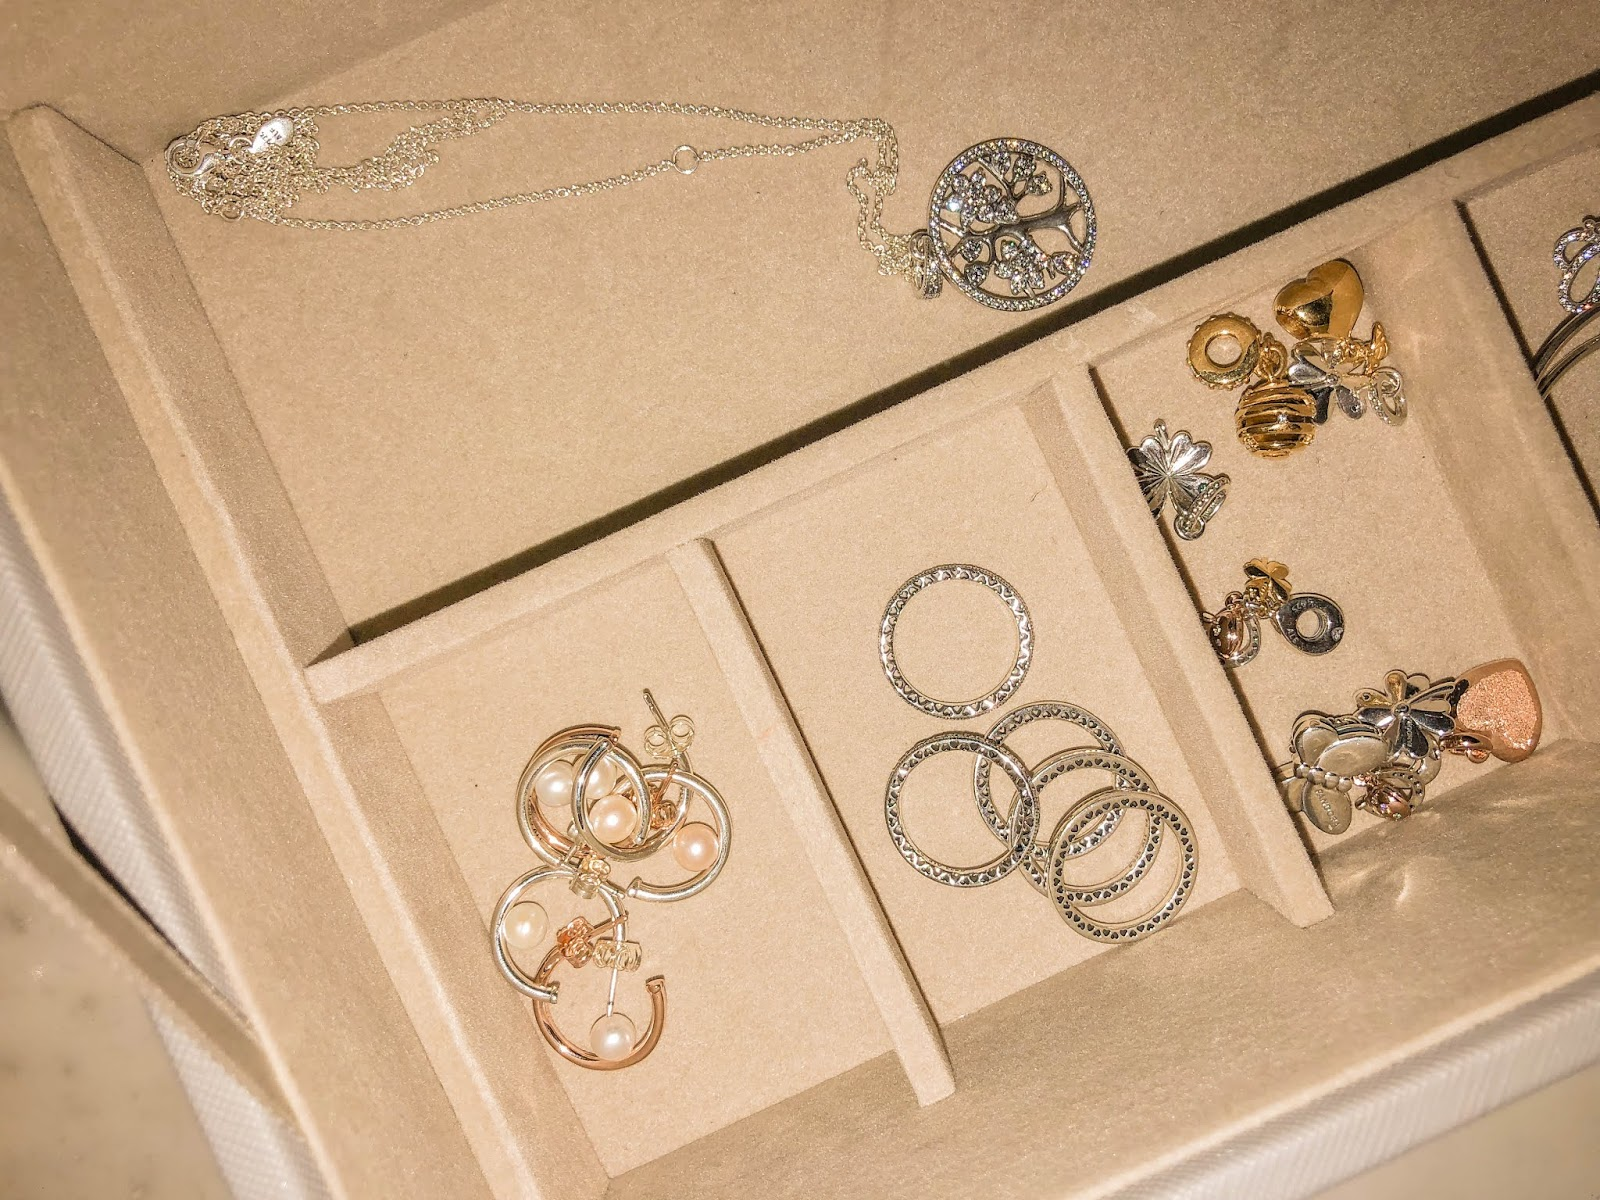 Pandora Garden spring/summer 2019 jewellery collection